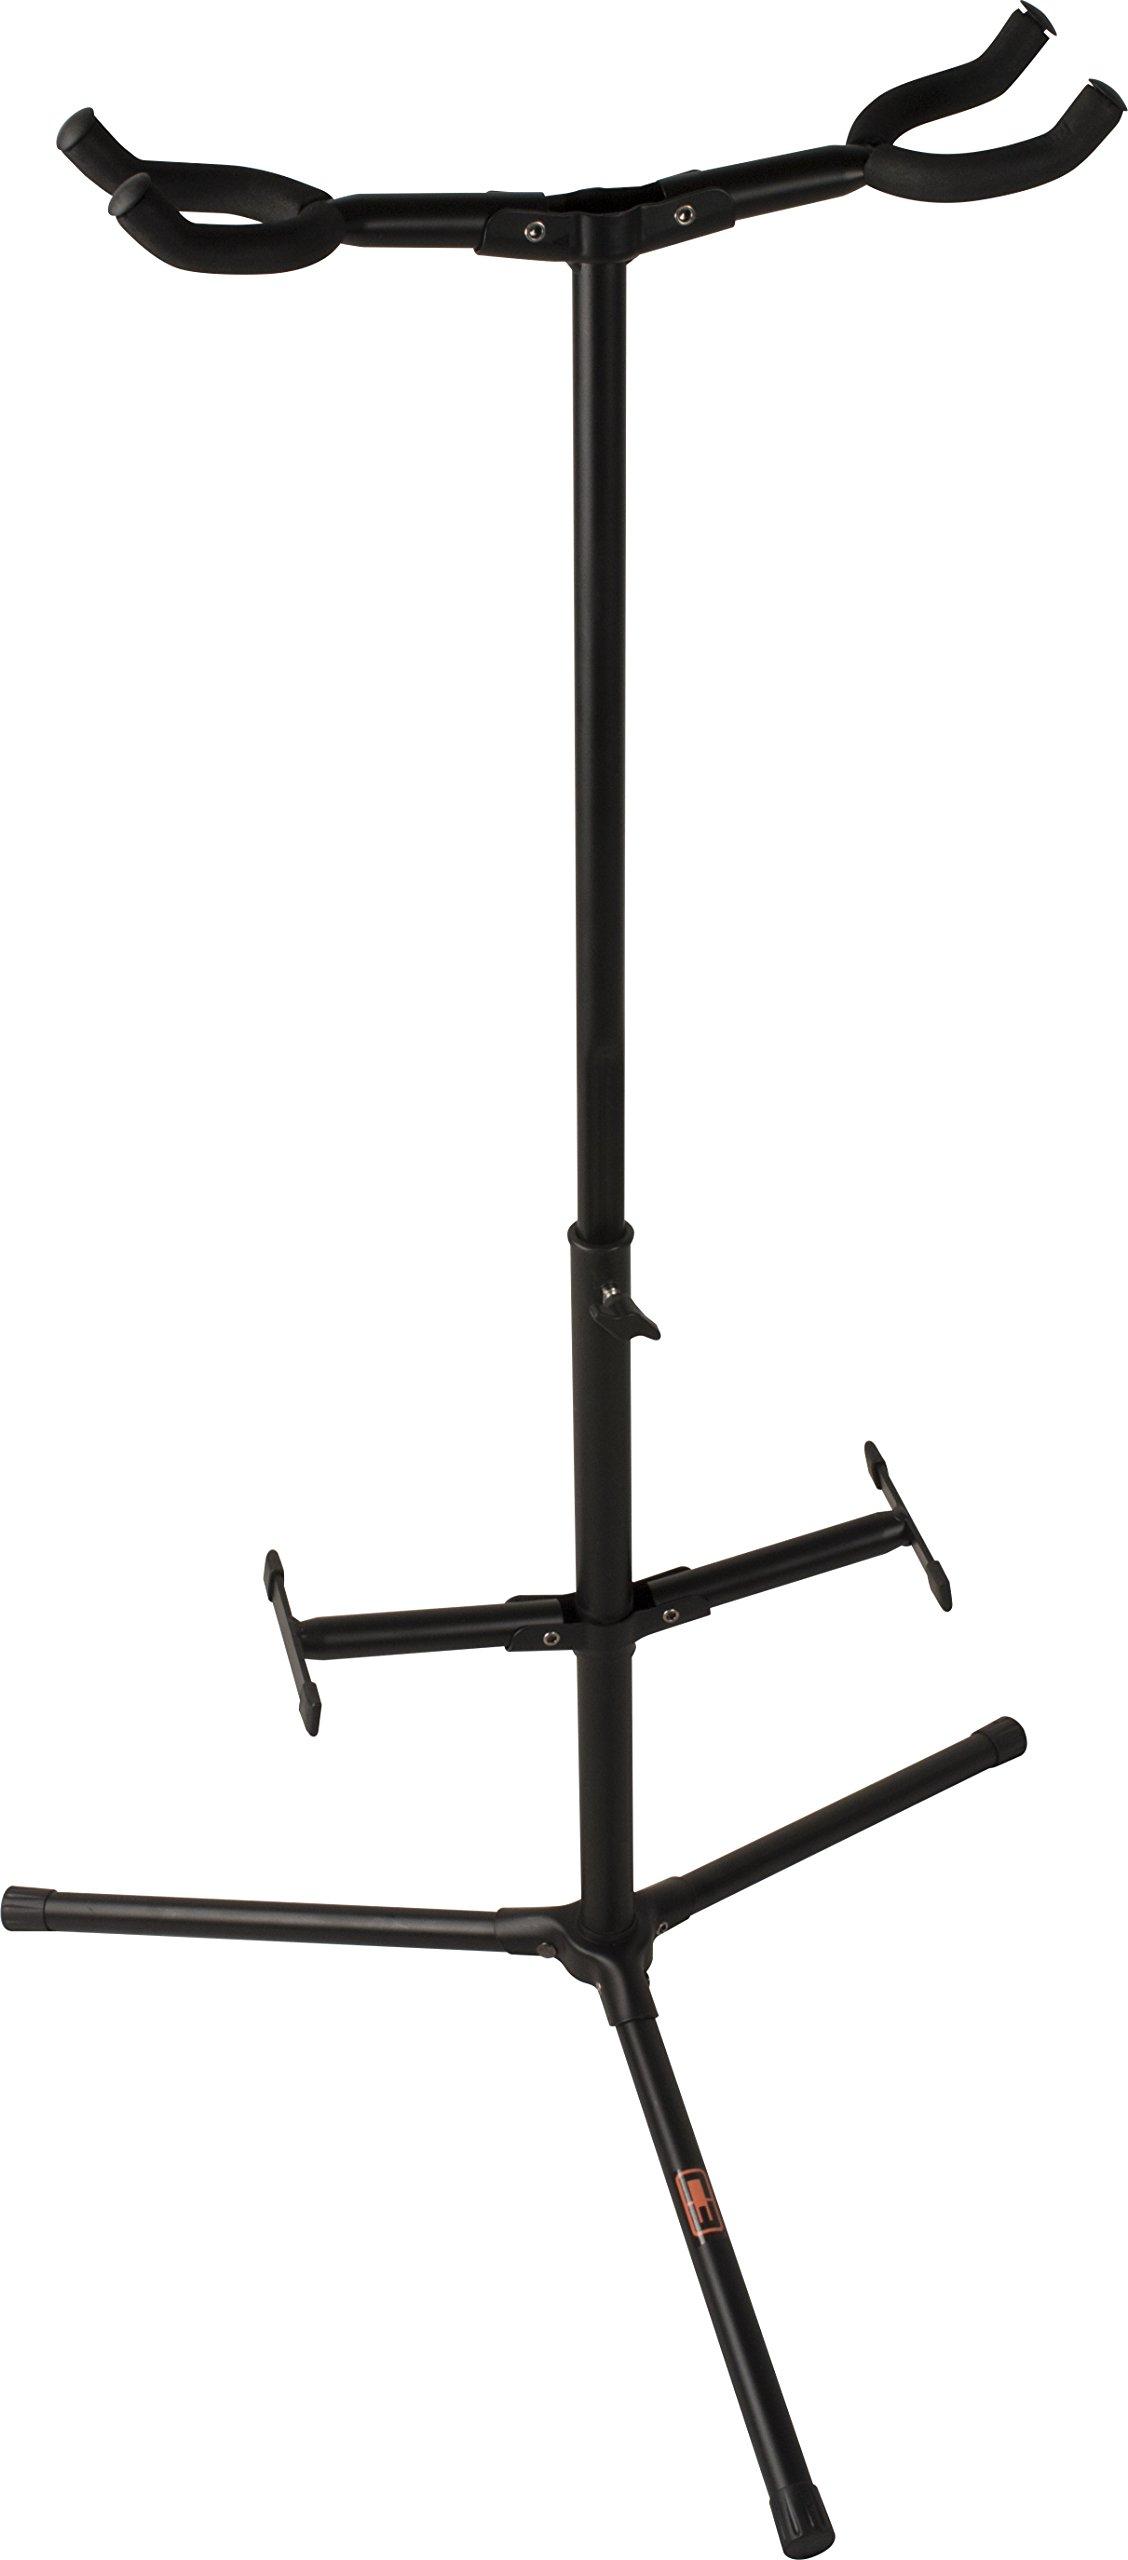 C3 CS-GS2 Tripod Base Dual Guitar Stand, Black